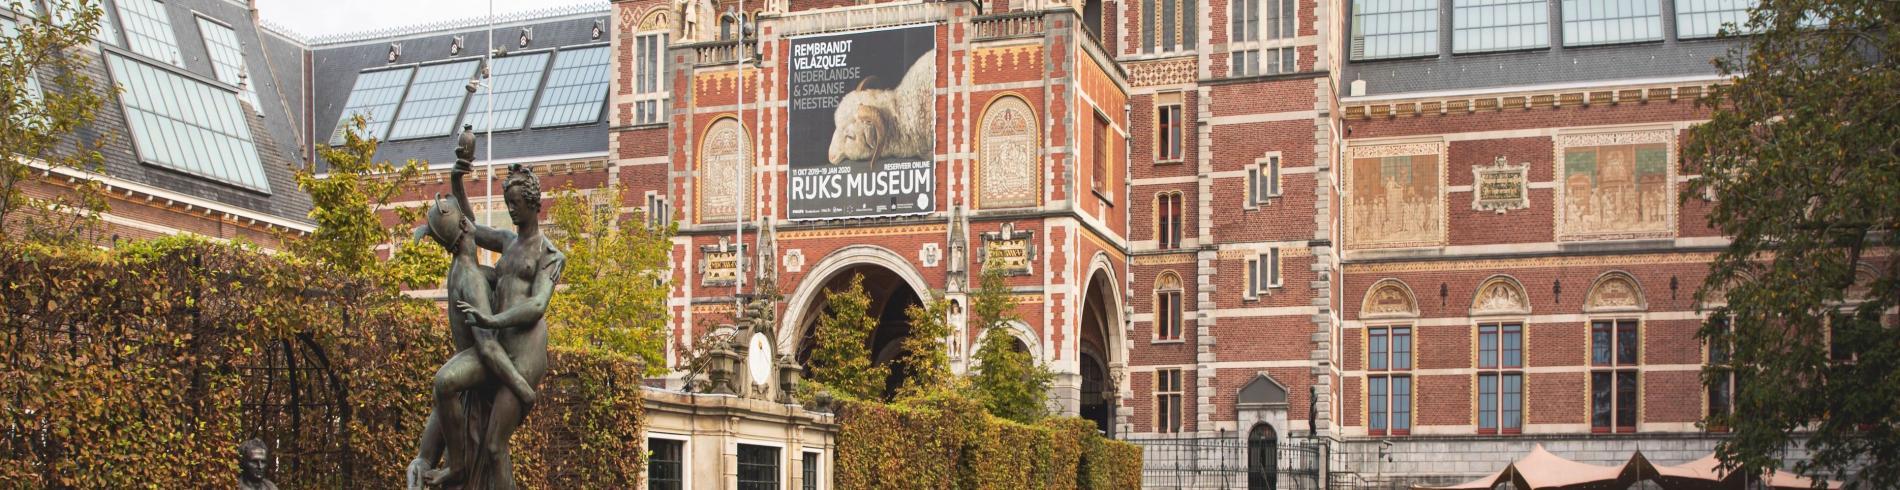 The Rijksmuseum on Museumplein